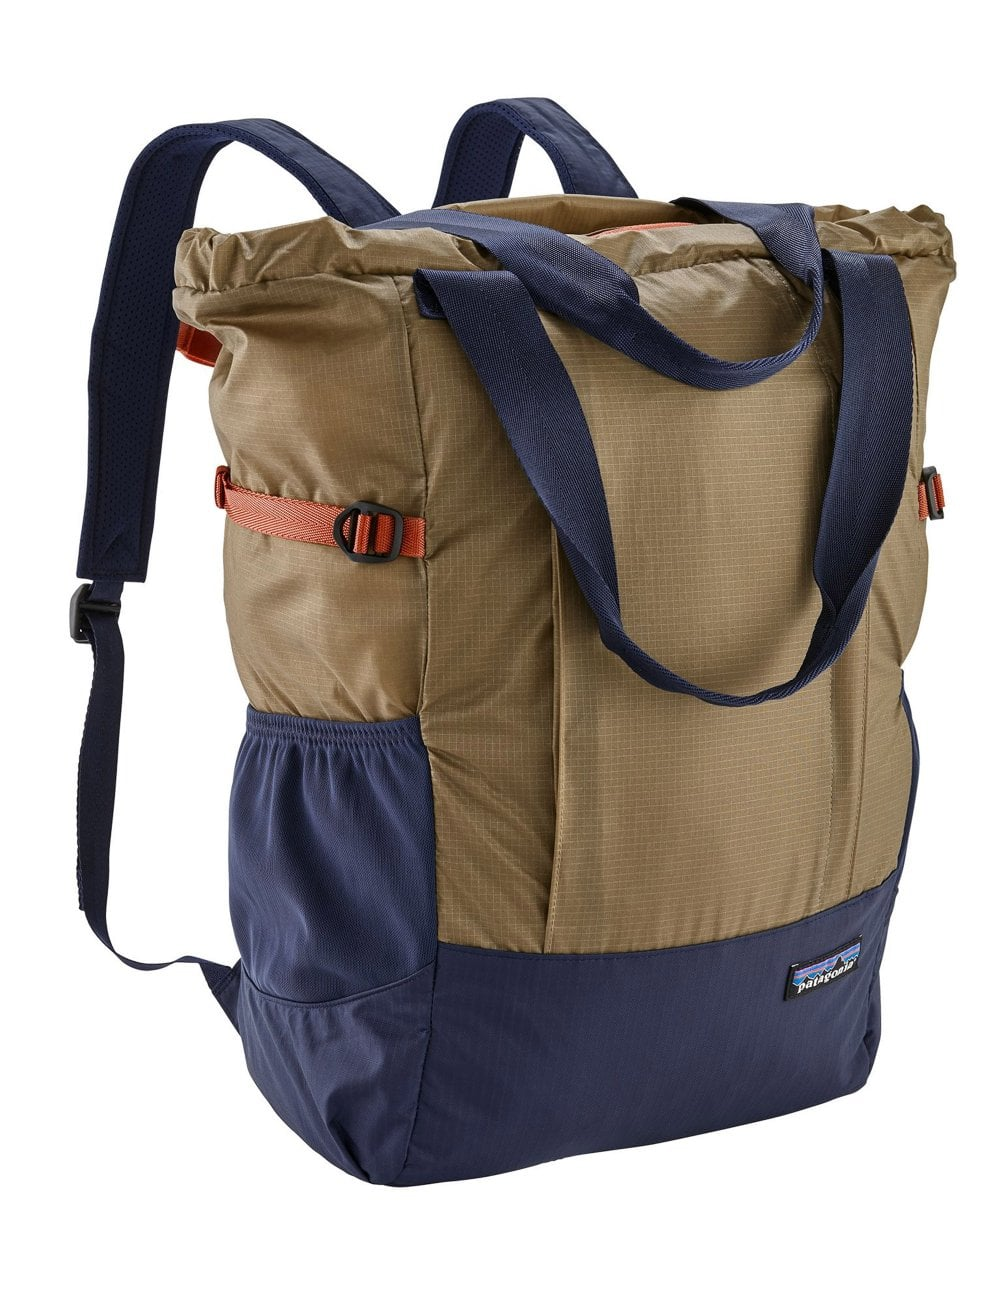 Lightweight Travel Tote Bag Mojave Khaki